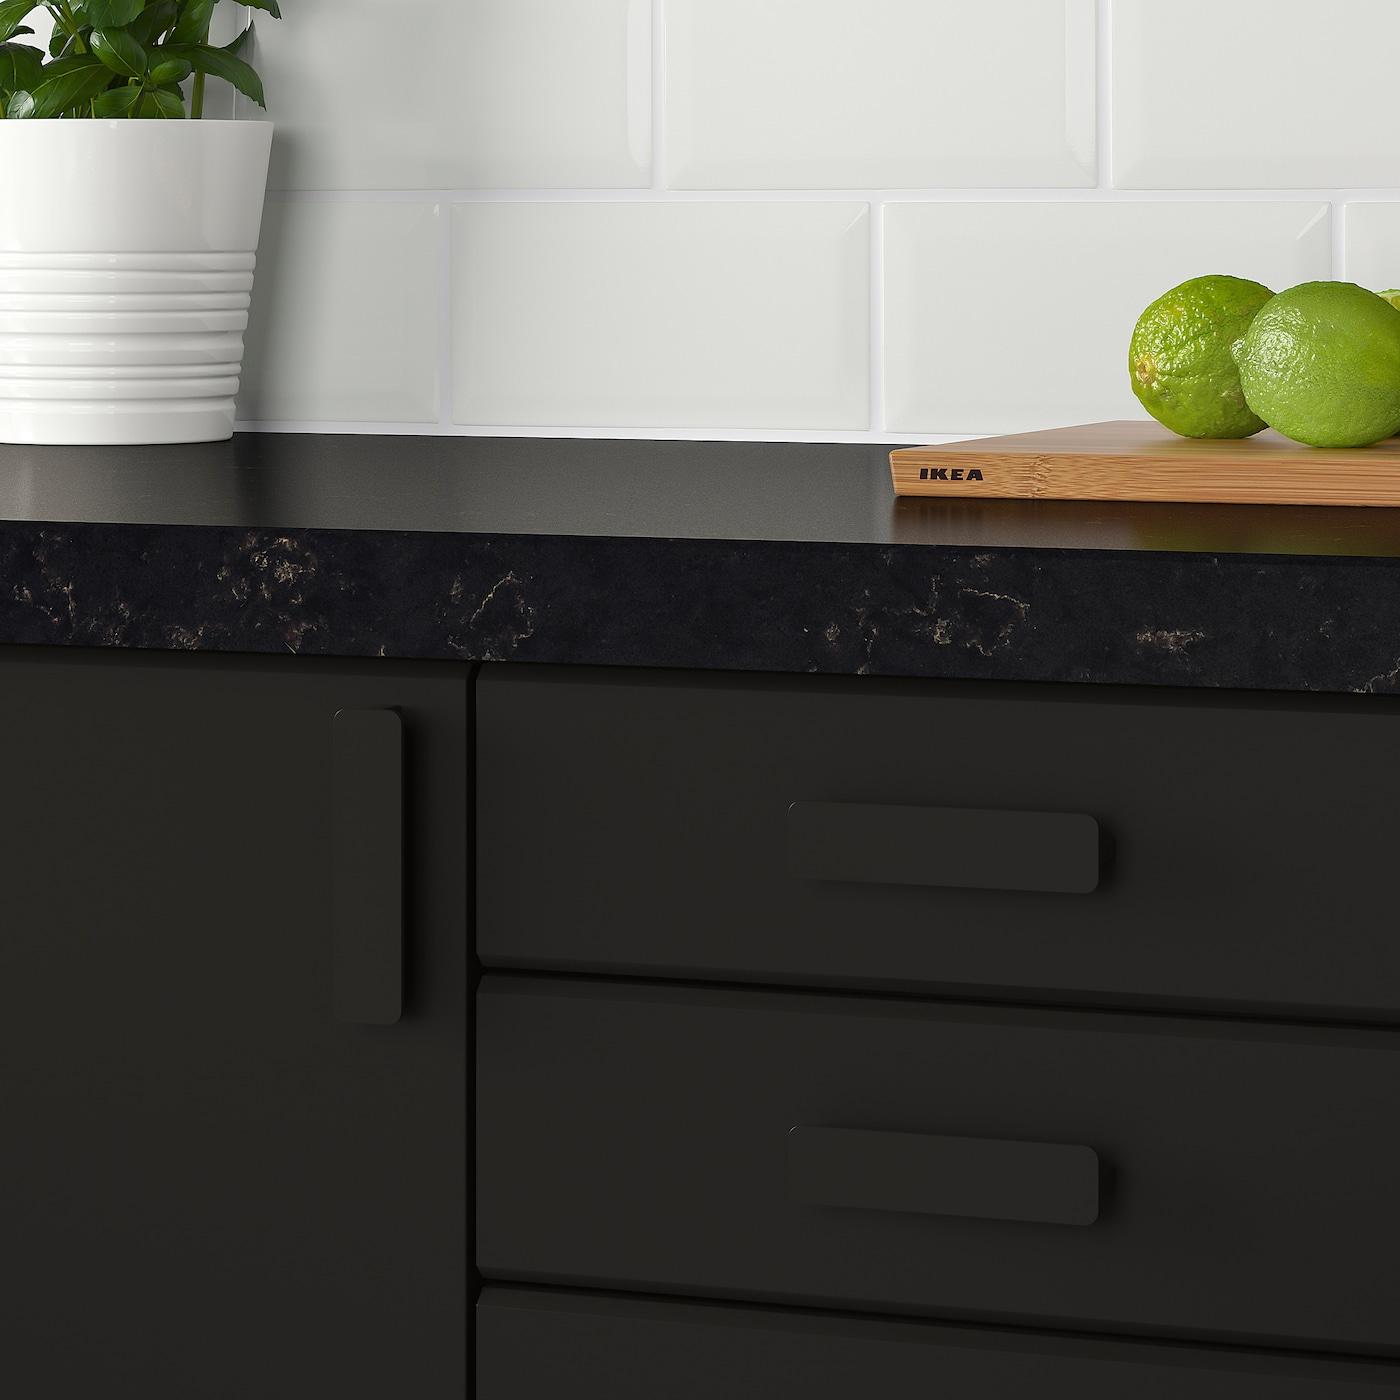 Pannelli Rivestimento Cucina Ikea hackÅs maniglia - antracite 100 mm